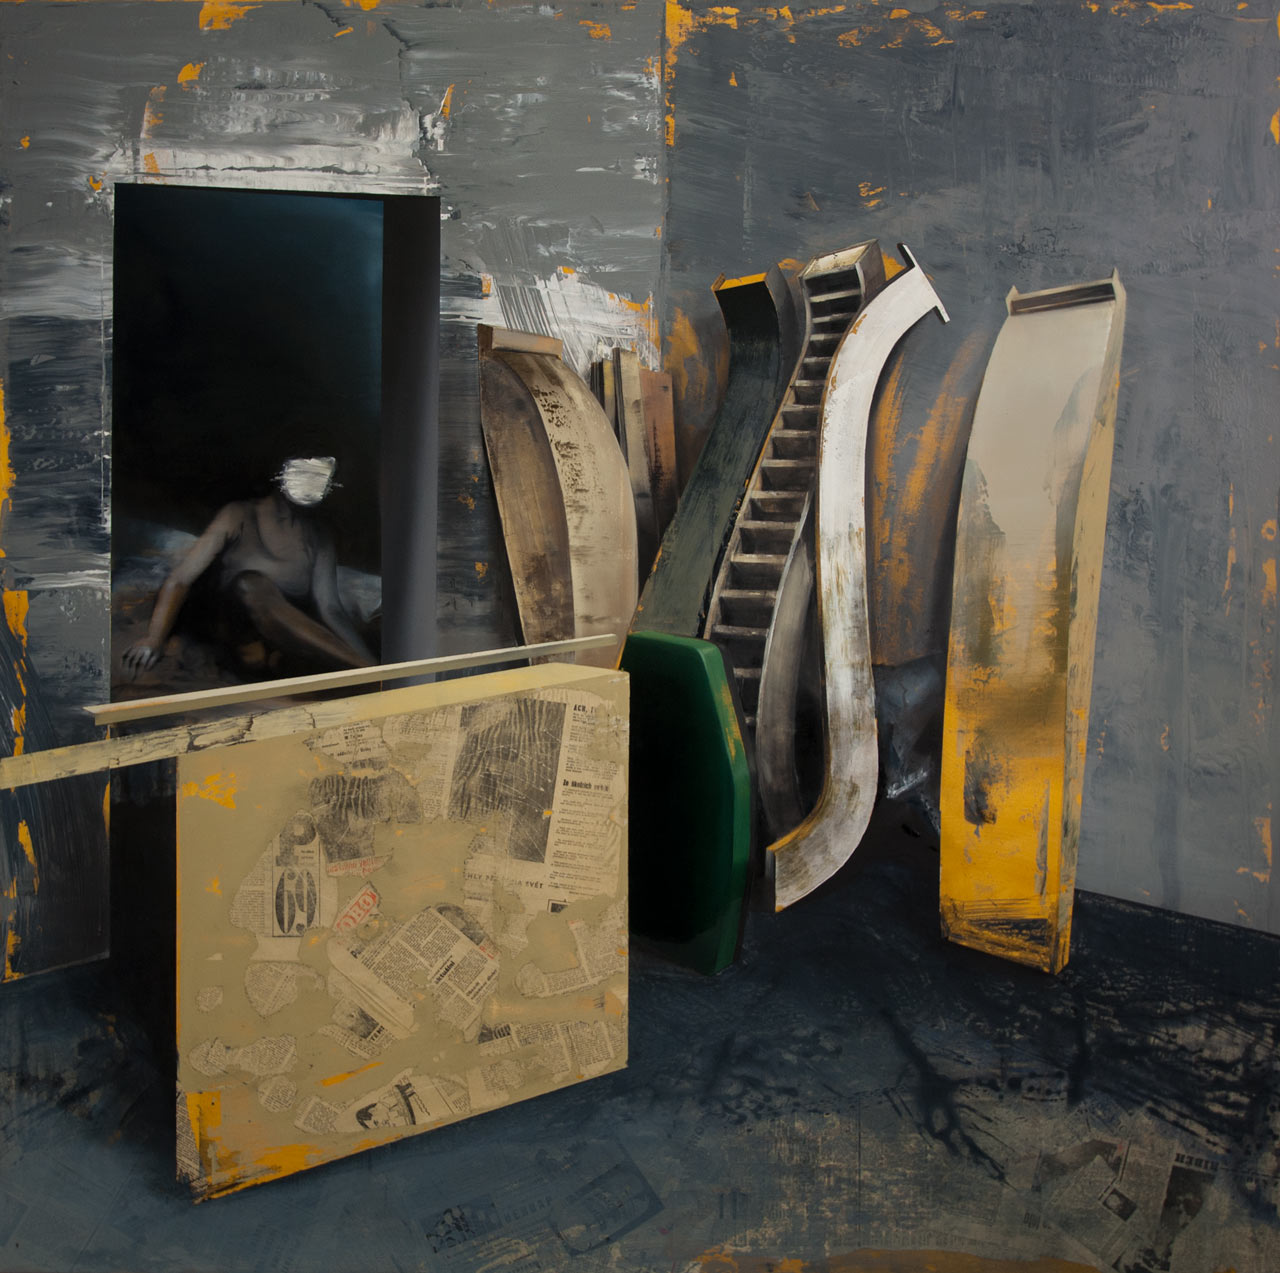 Levitace - akryl, olej a koláž na plátně, 165 x 165 cm, 2019